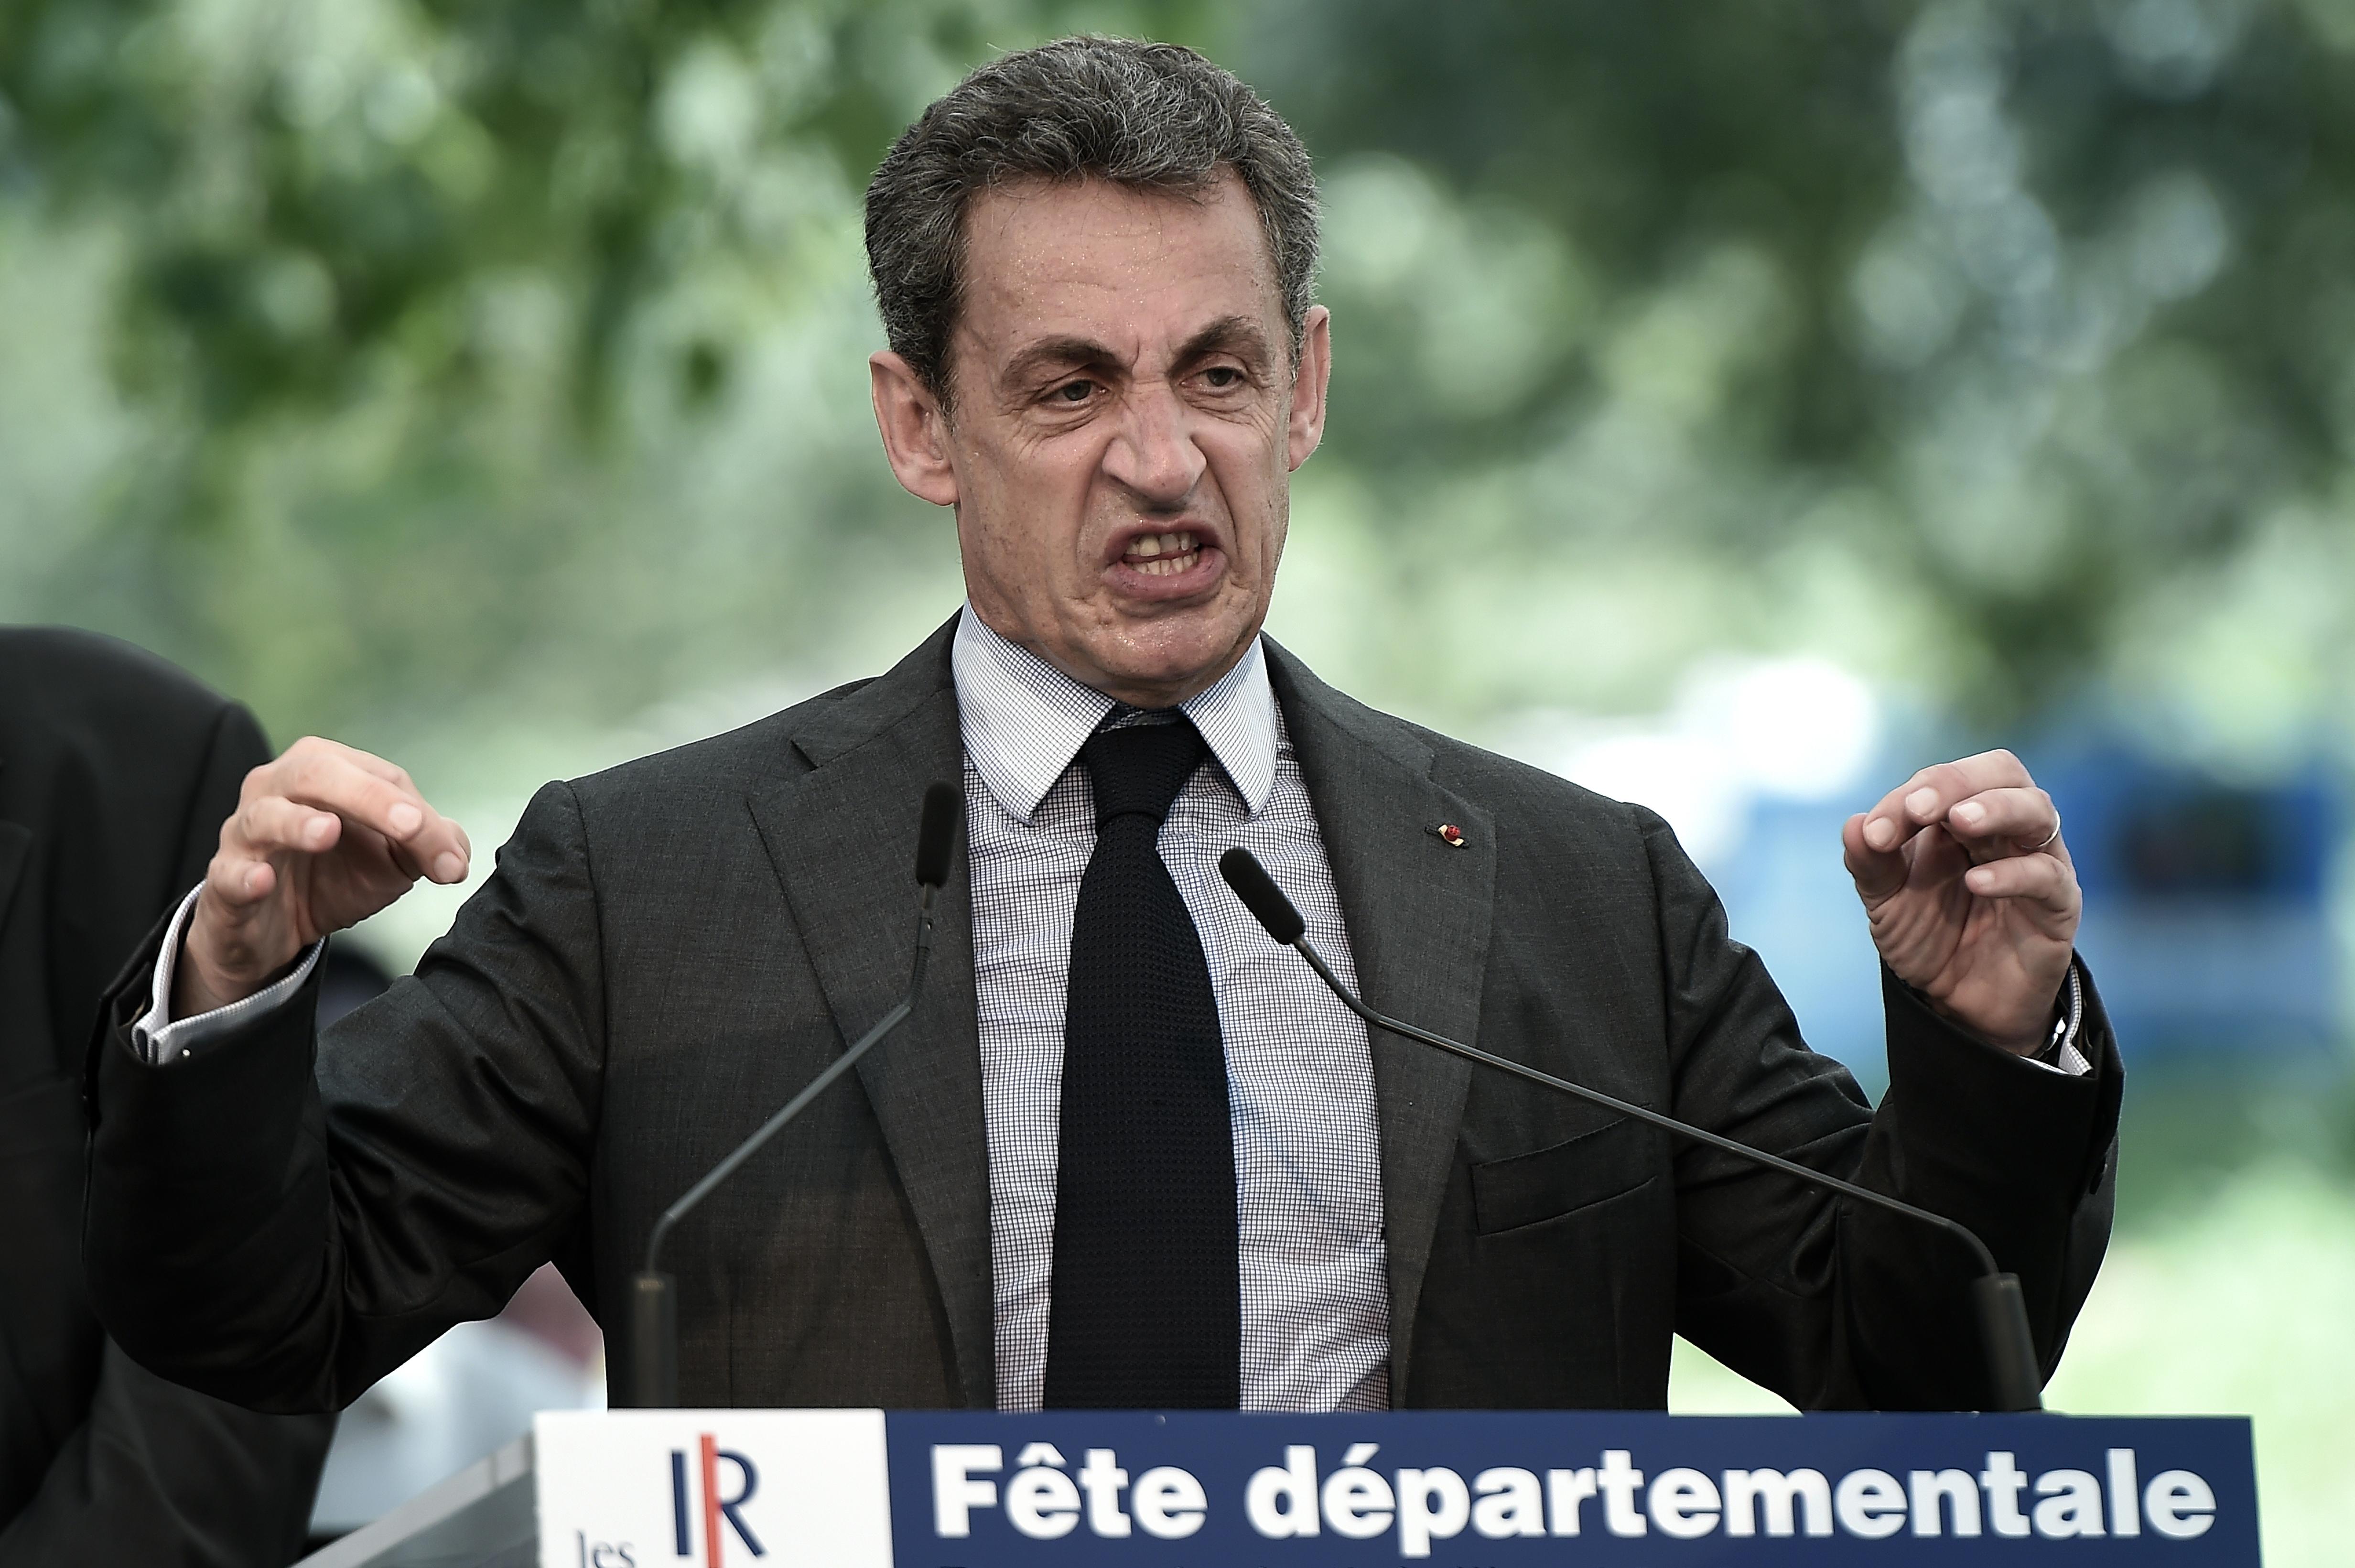 Bíróság elé állítják Nicolas Sarkozyt